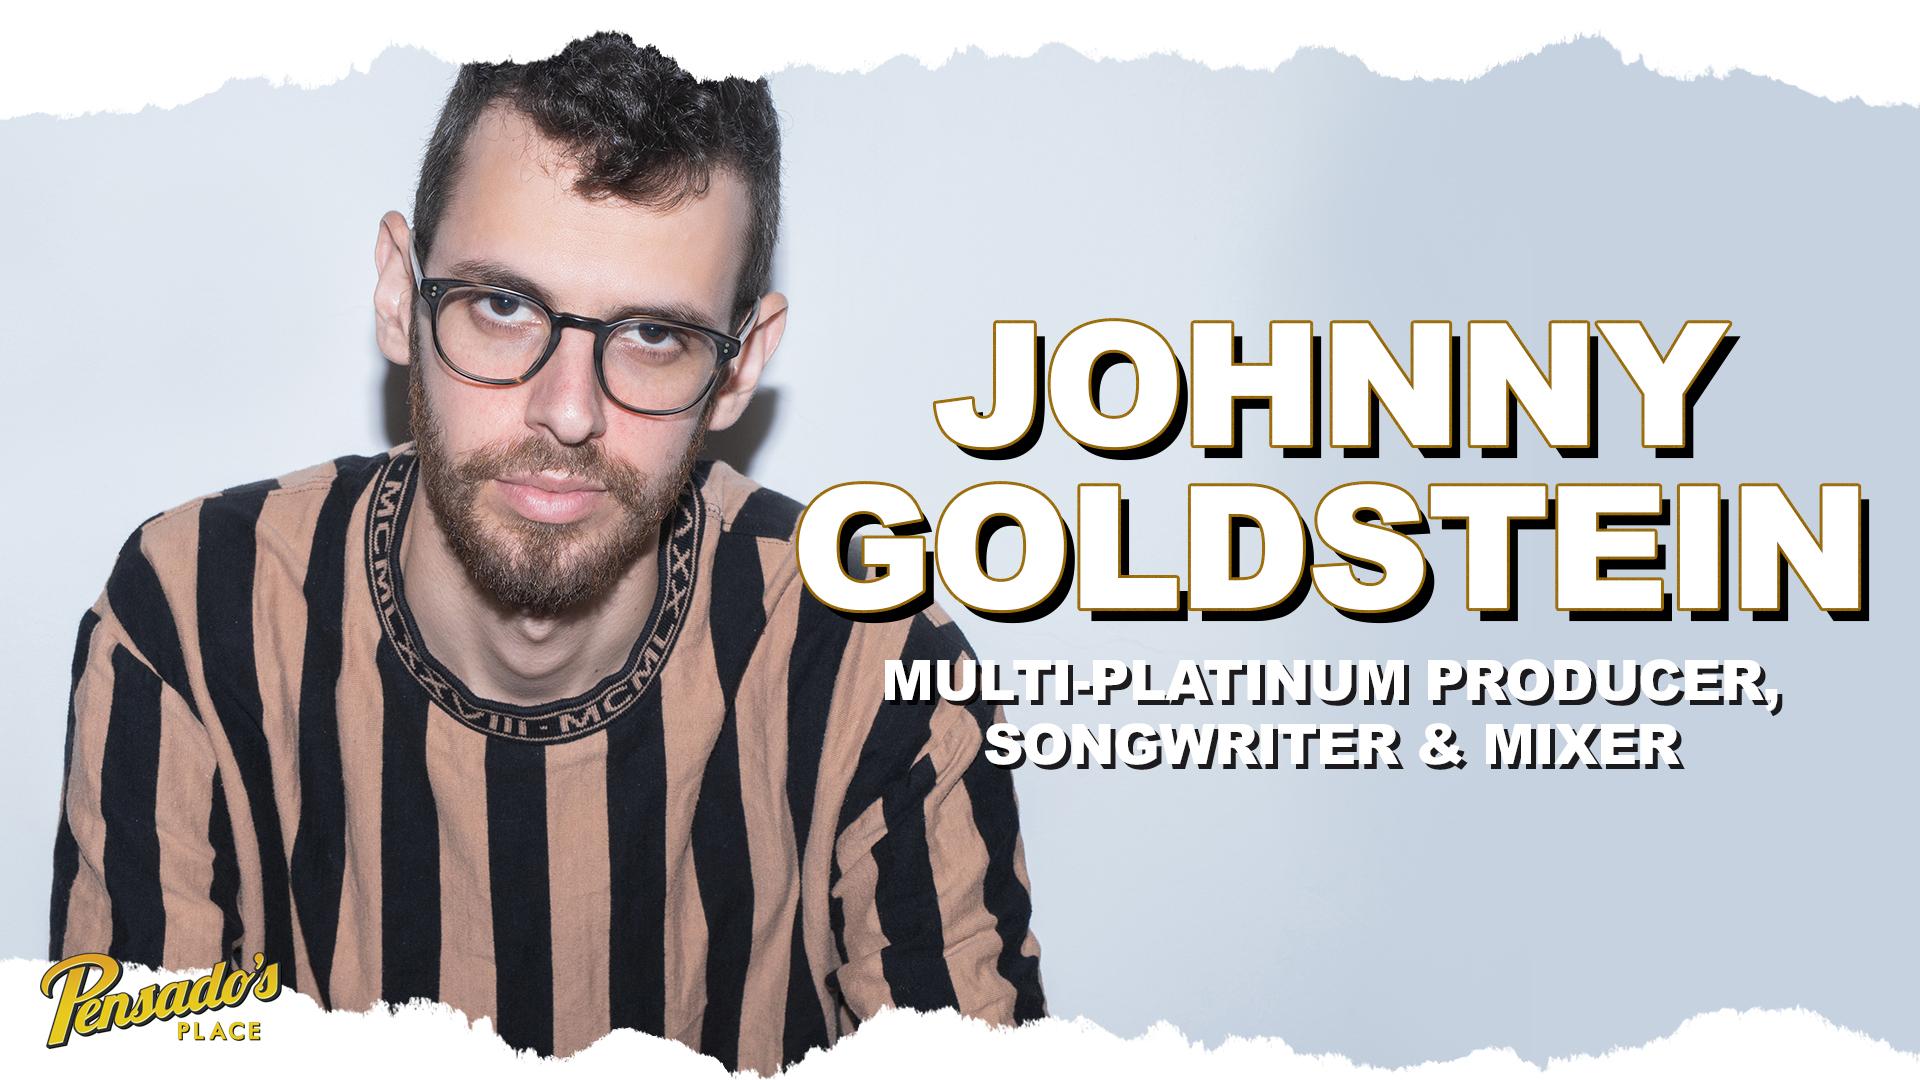 Multi-Platinum Producer / Songwriter / Mixer, Johnny Goldstein